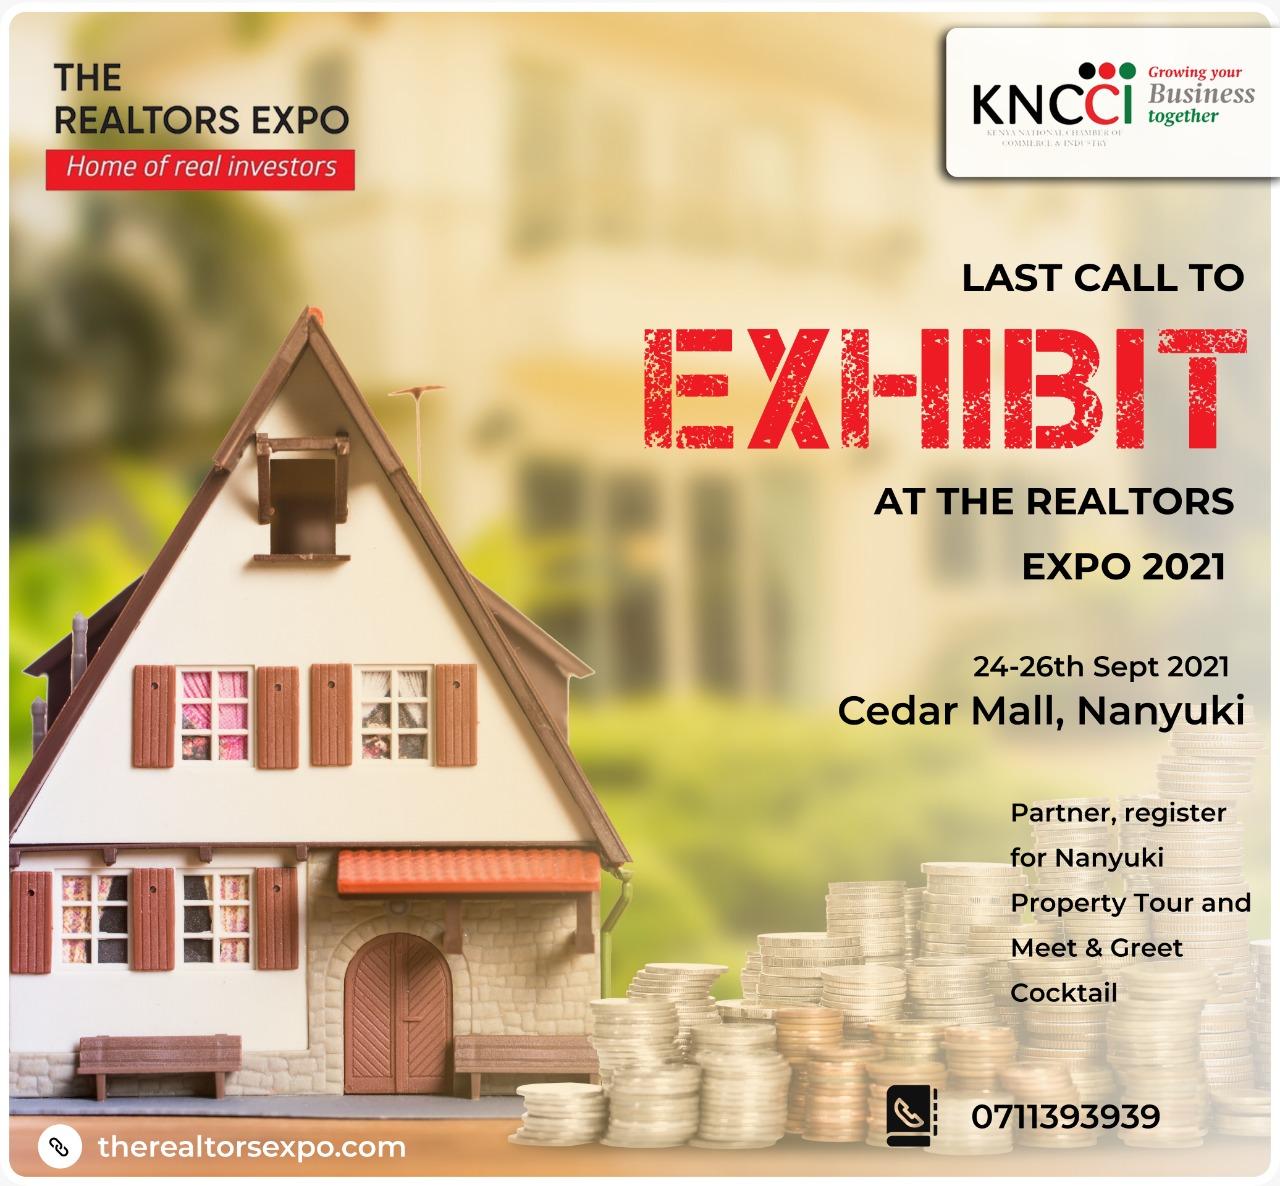 The Realtors Expo Nanyuki 2021 Exhibit